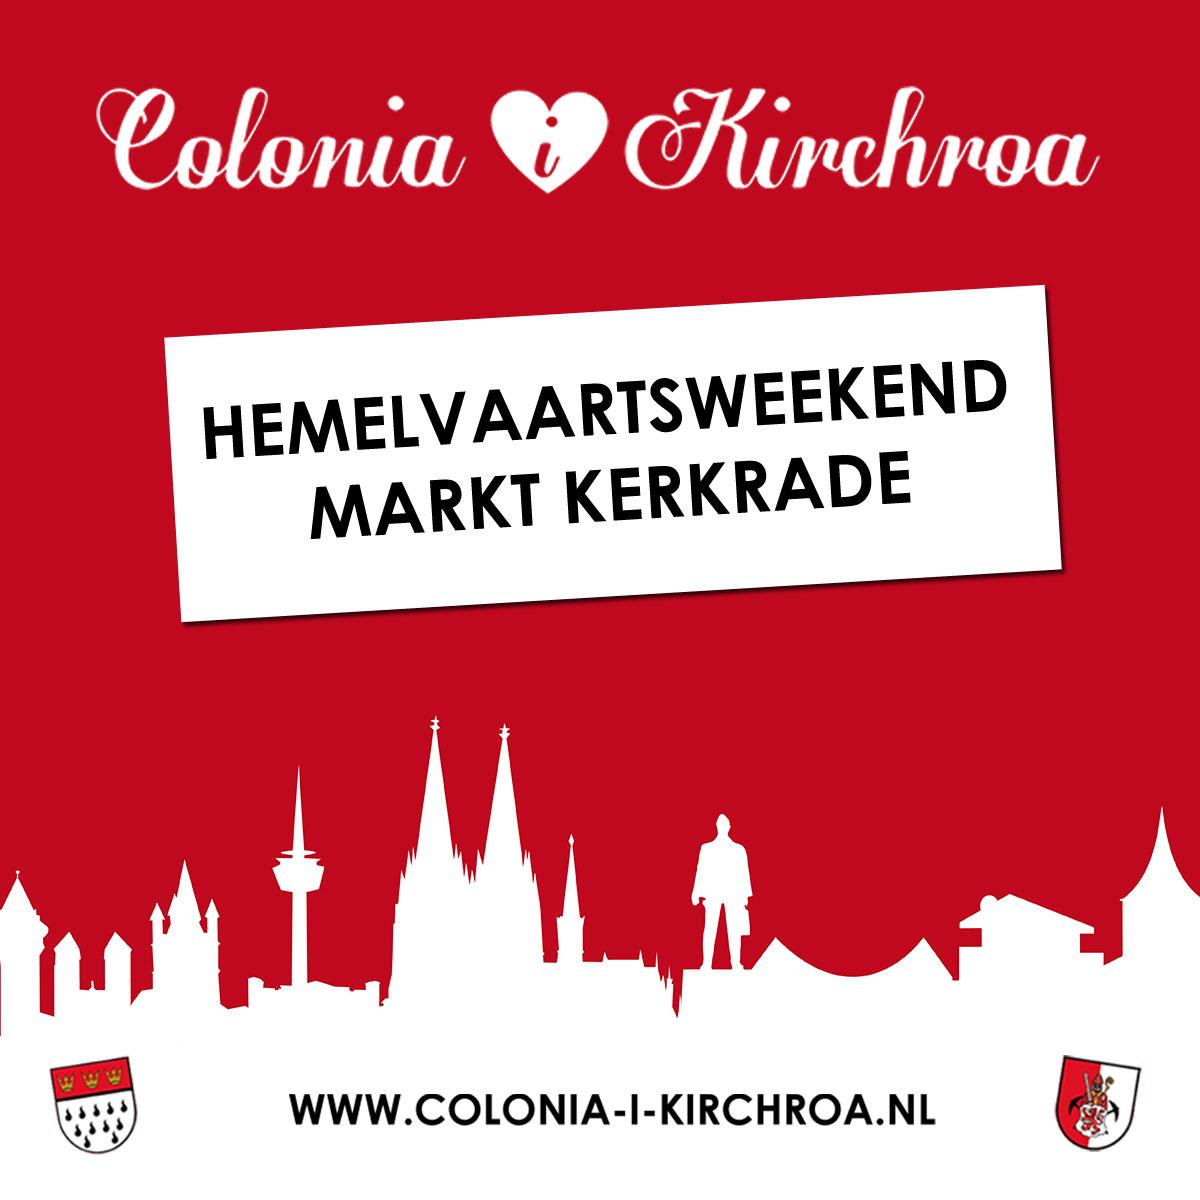 Colonia i Kirchroa hemelvaartsweekend